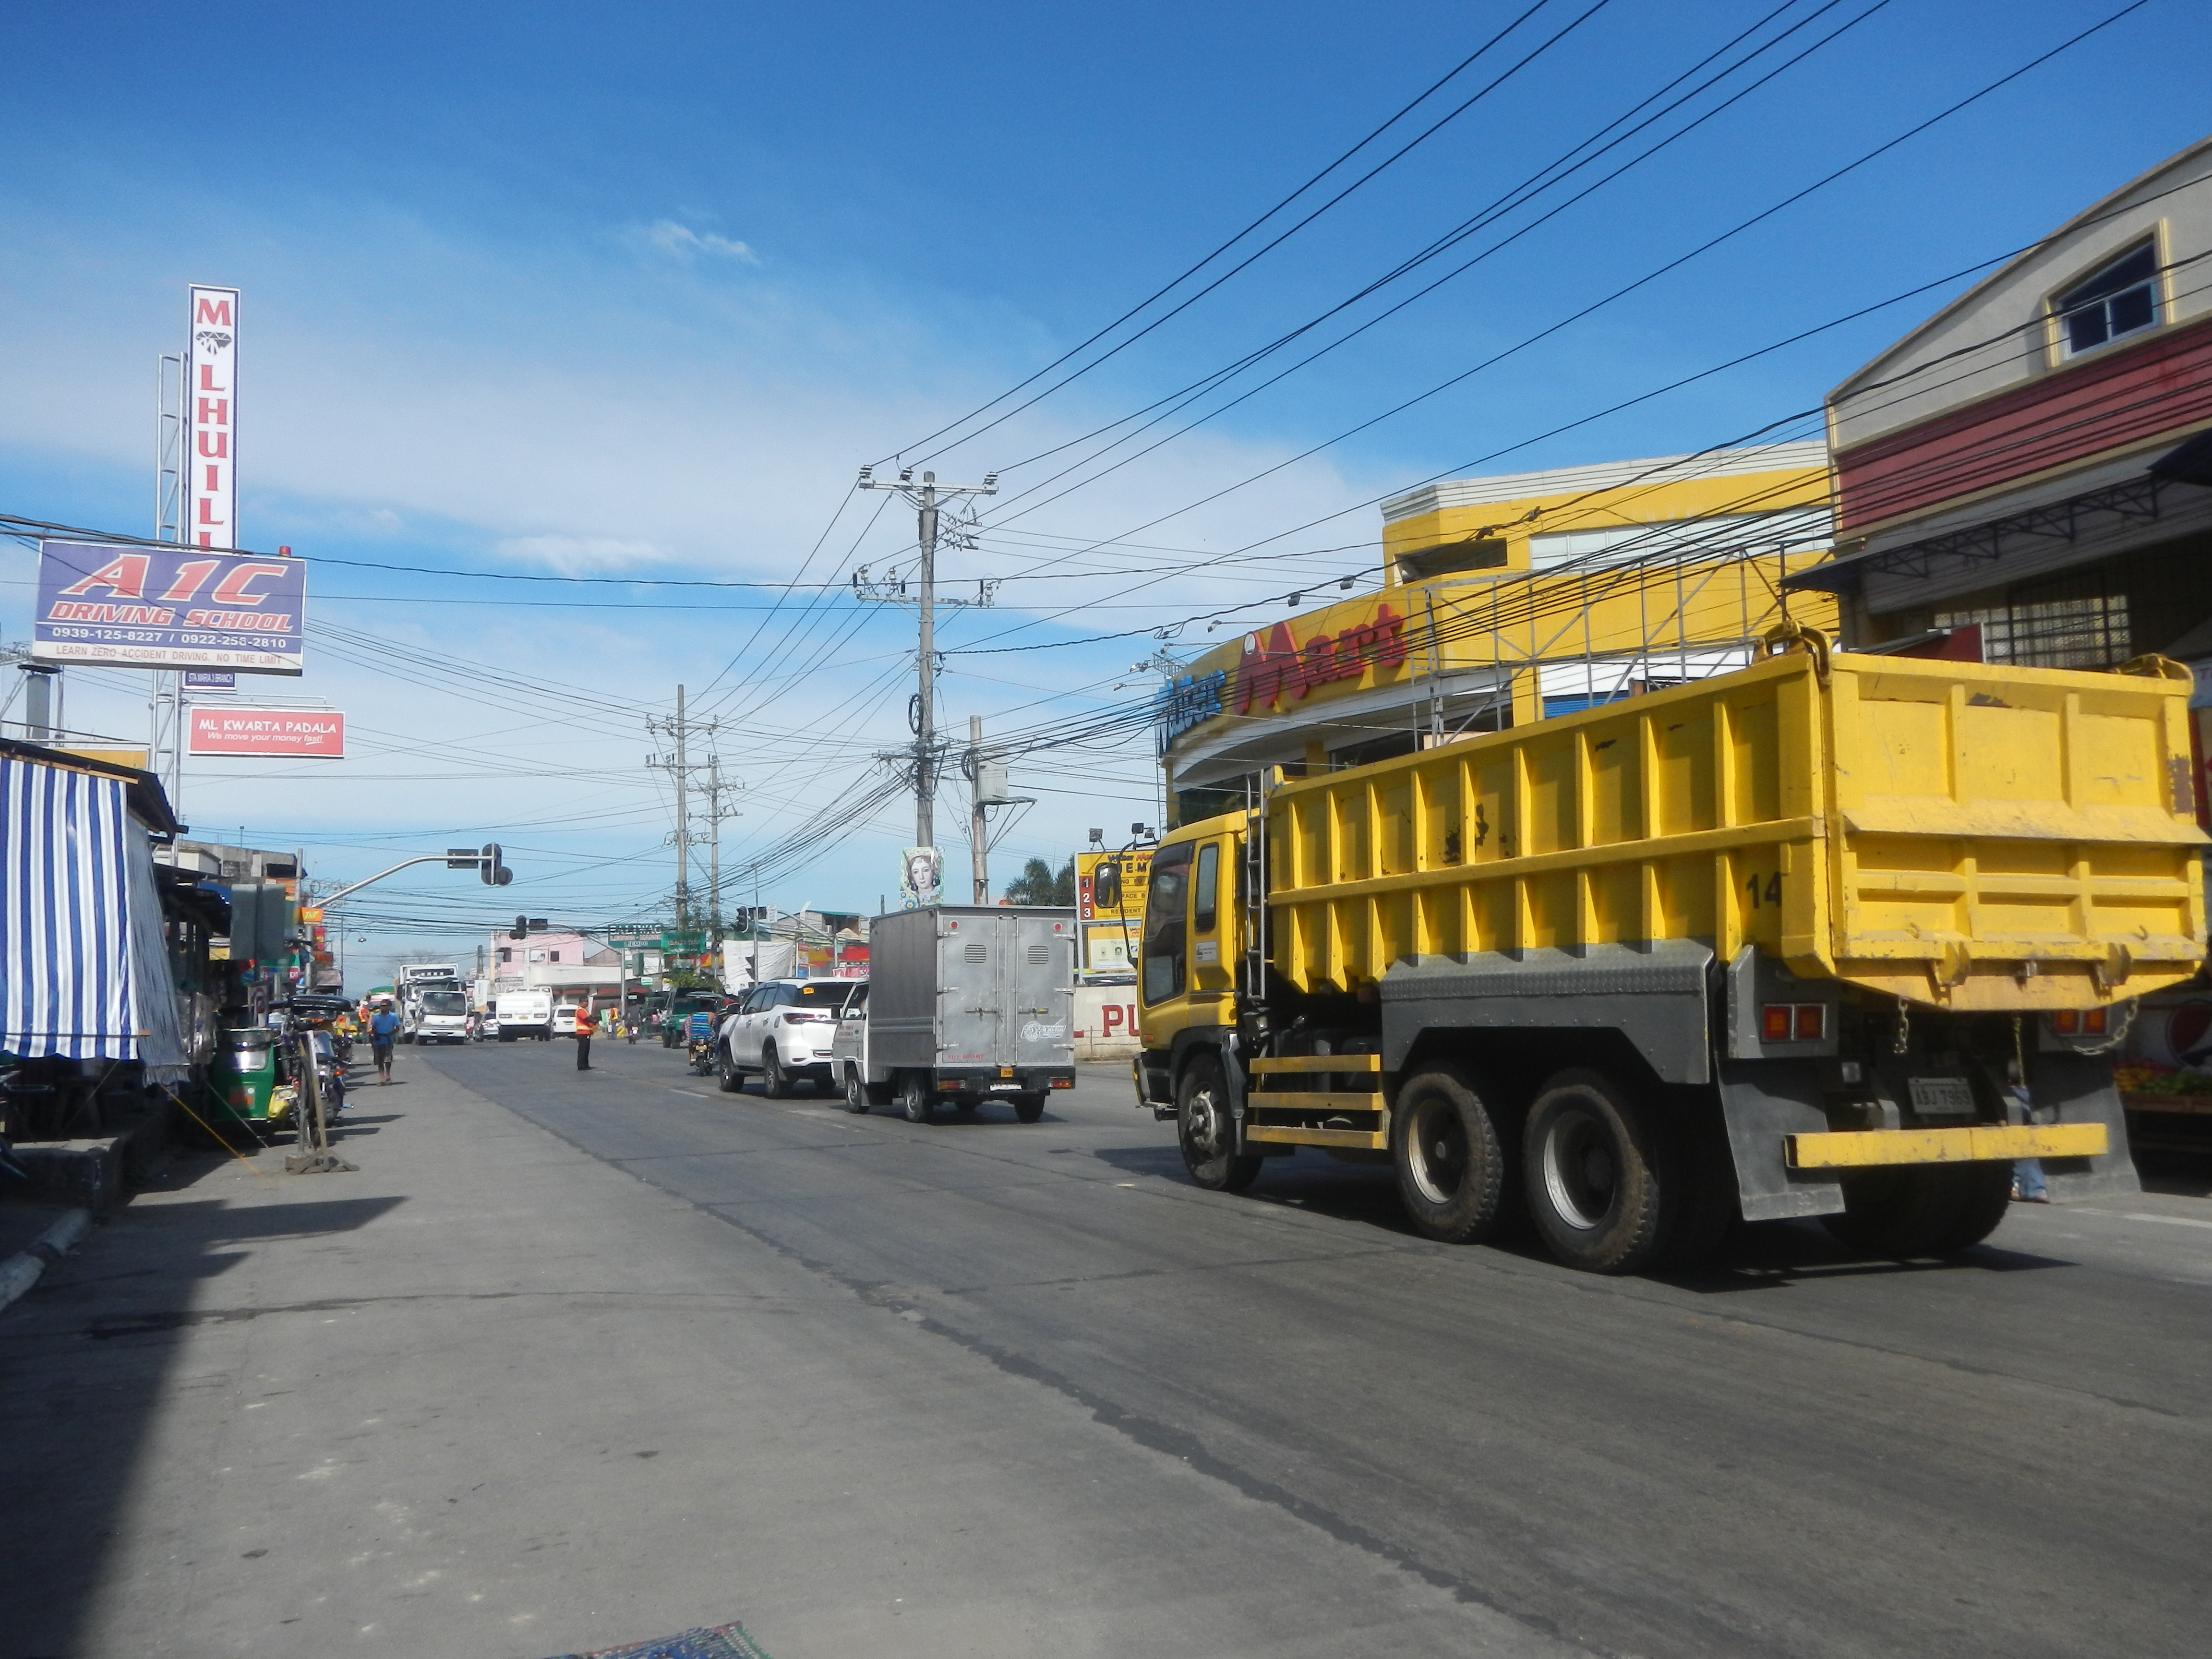 File09664jfwalter Mart Santa Clara Crossing Narra J P Rizal By